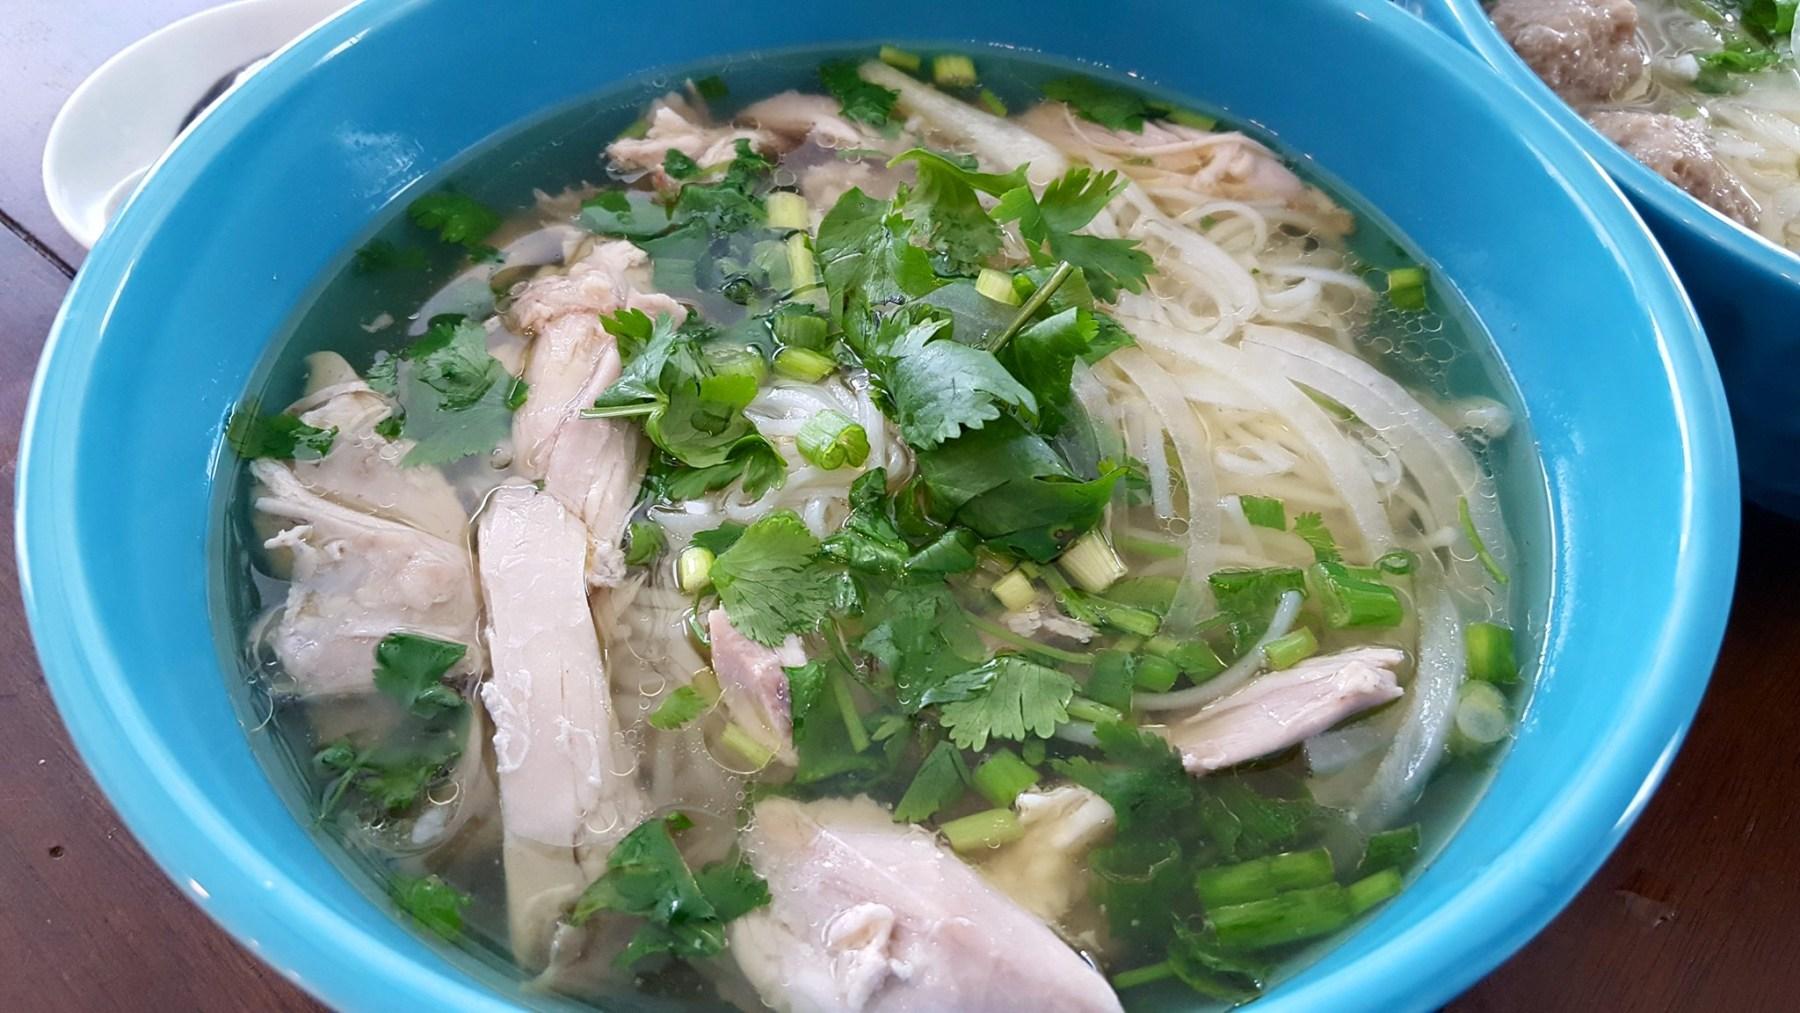 Basic Phở Gà Instant Pot (Chicken Pho)